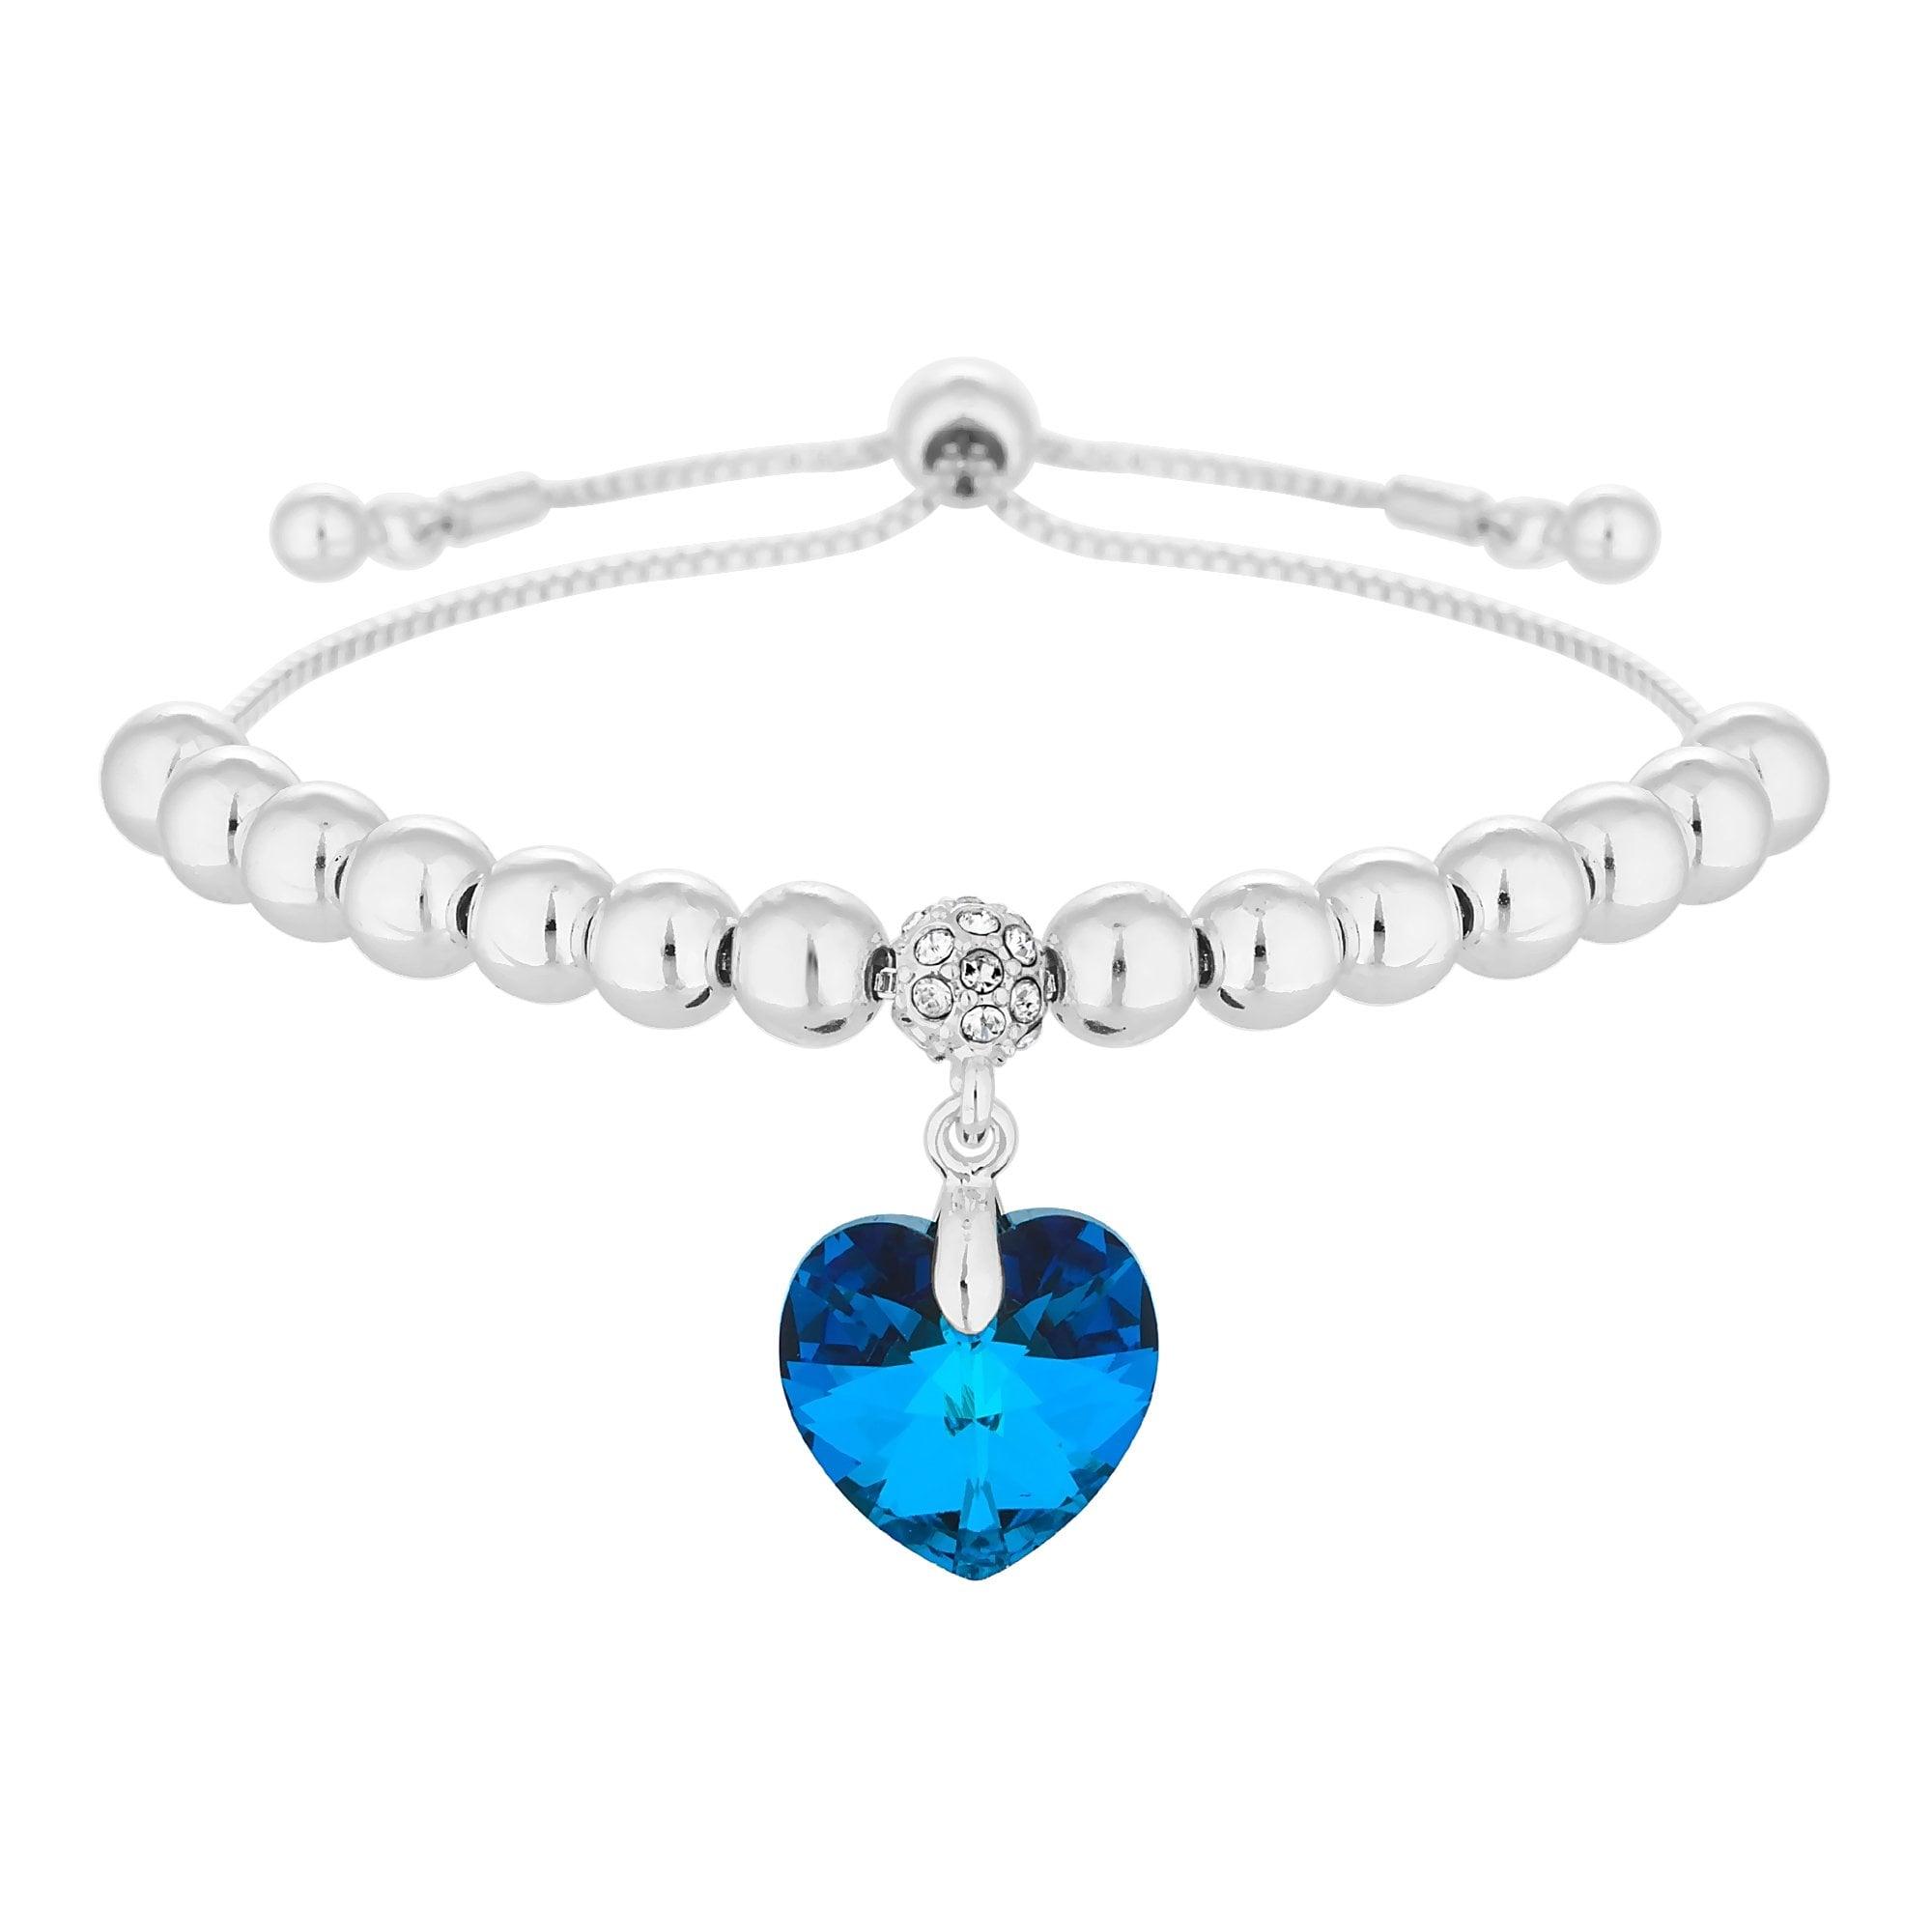 Silver Plated Blue Heart Toggle Bracelet Embellished With Swarovski Crystals